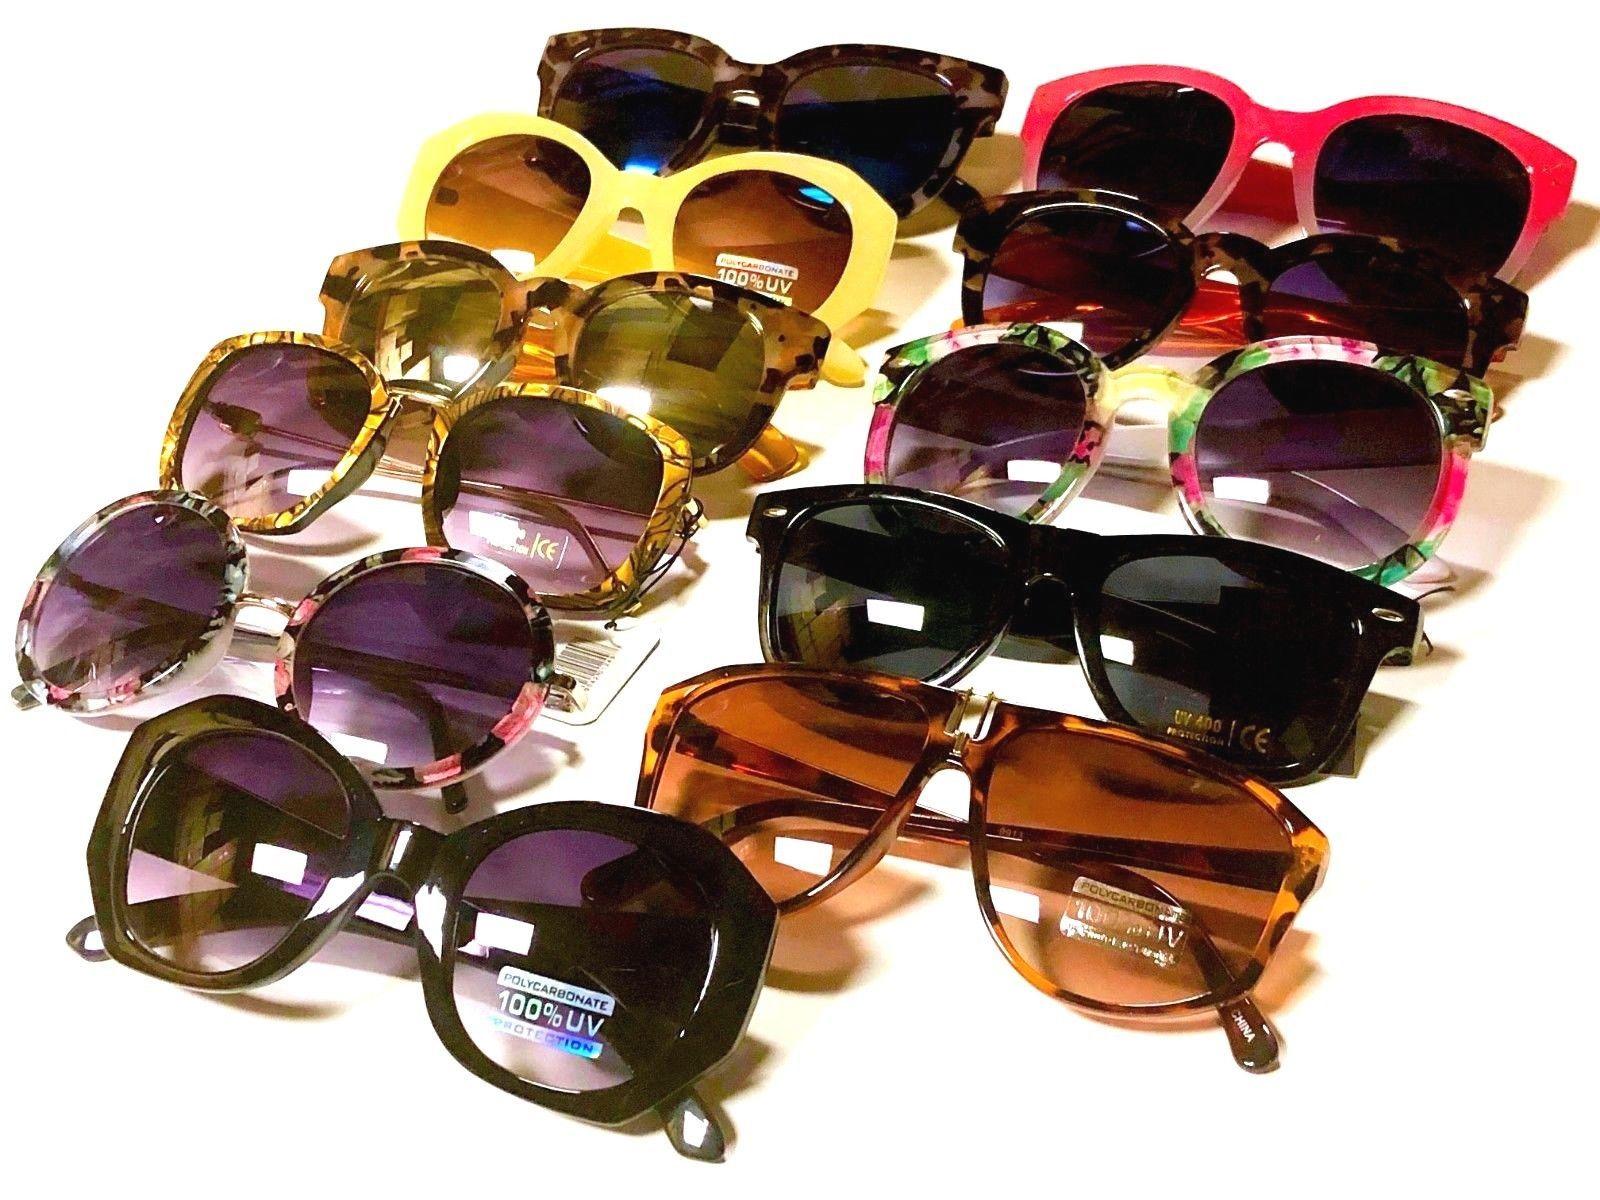 dd92bdd236 New Trendy Retro Fashion Cheap Sunglasses and 50 similar items